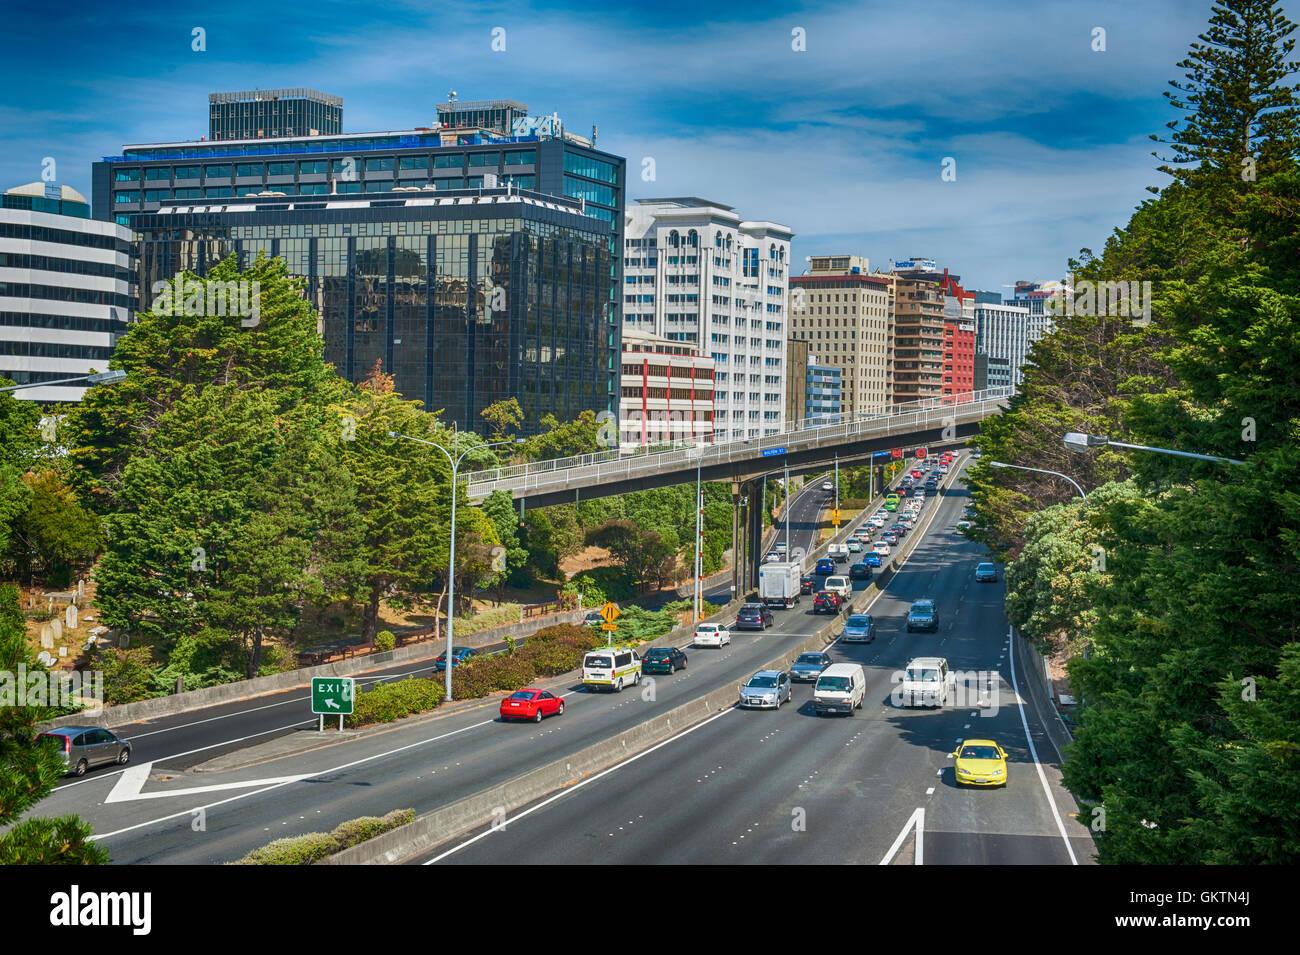 Wellington, New Zealand - March 3, 2016: View of Wellington Urban Motorway SH1 - Stock Image